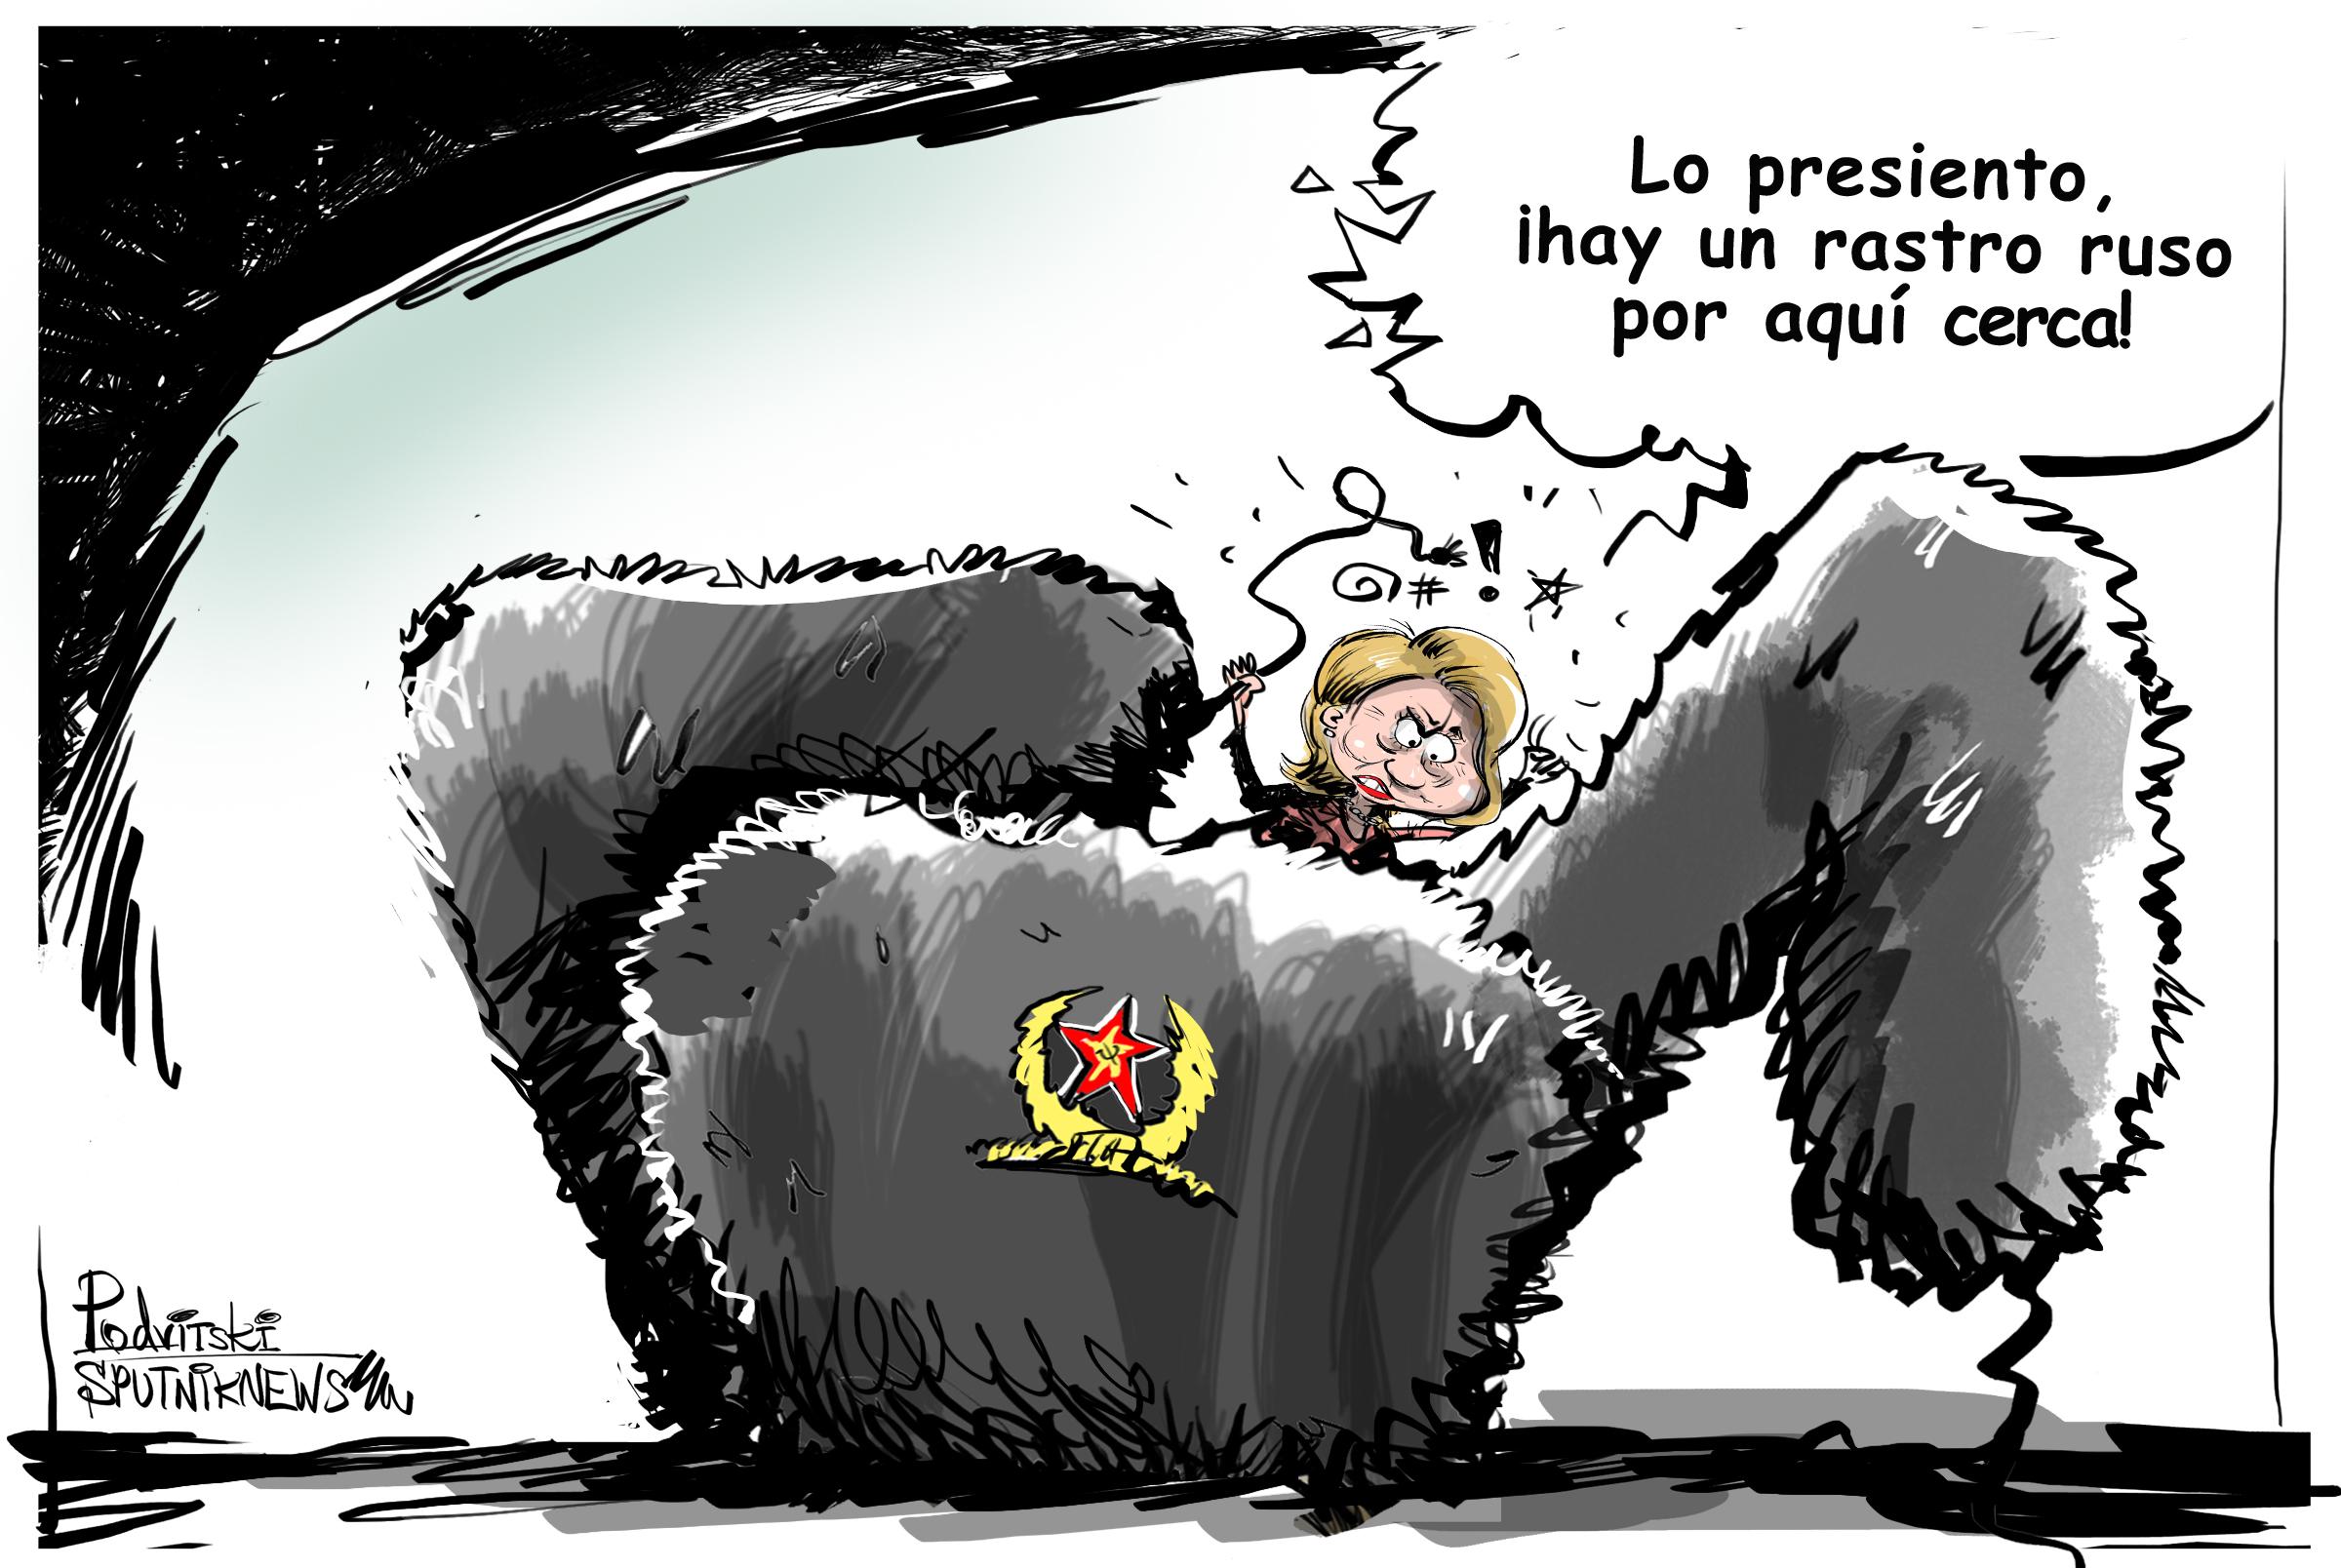 Clinton se pasa al bando ruso